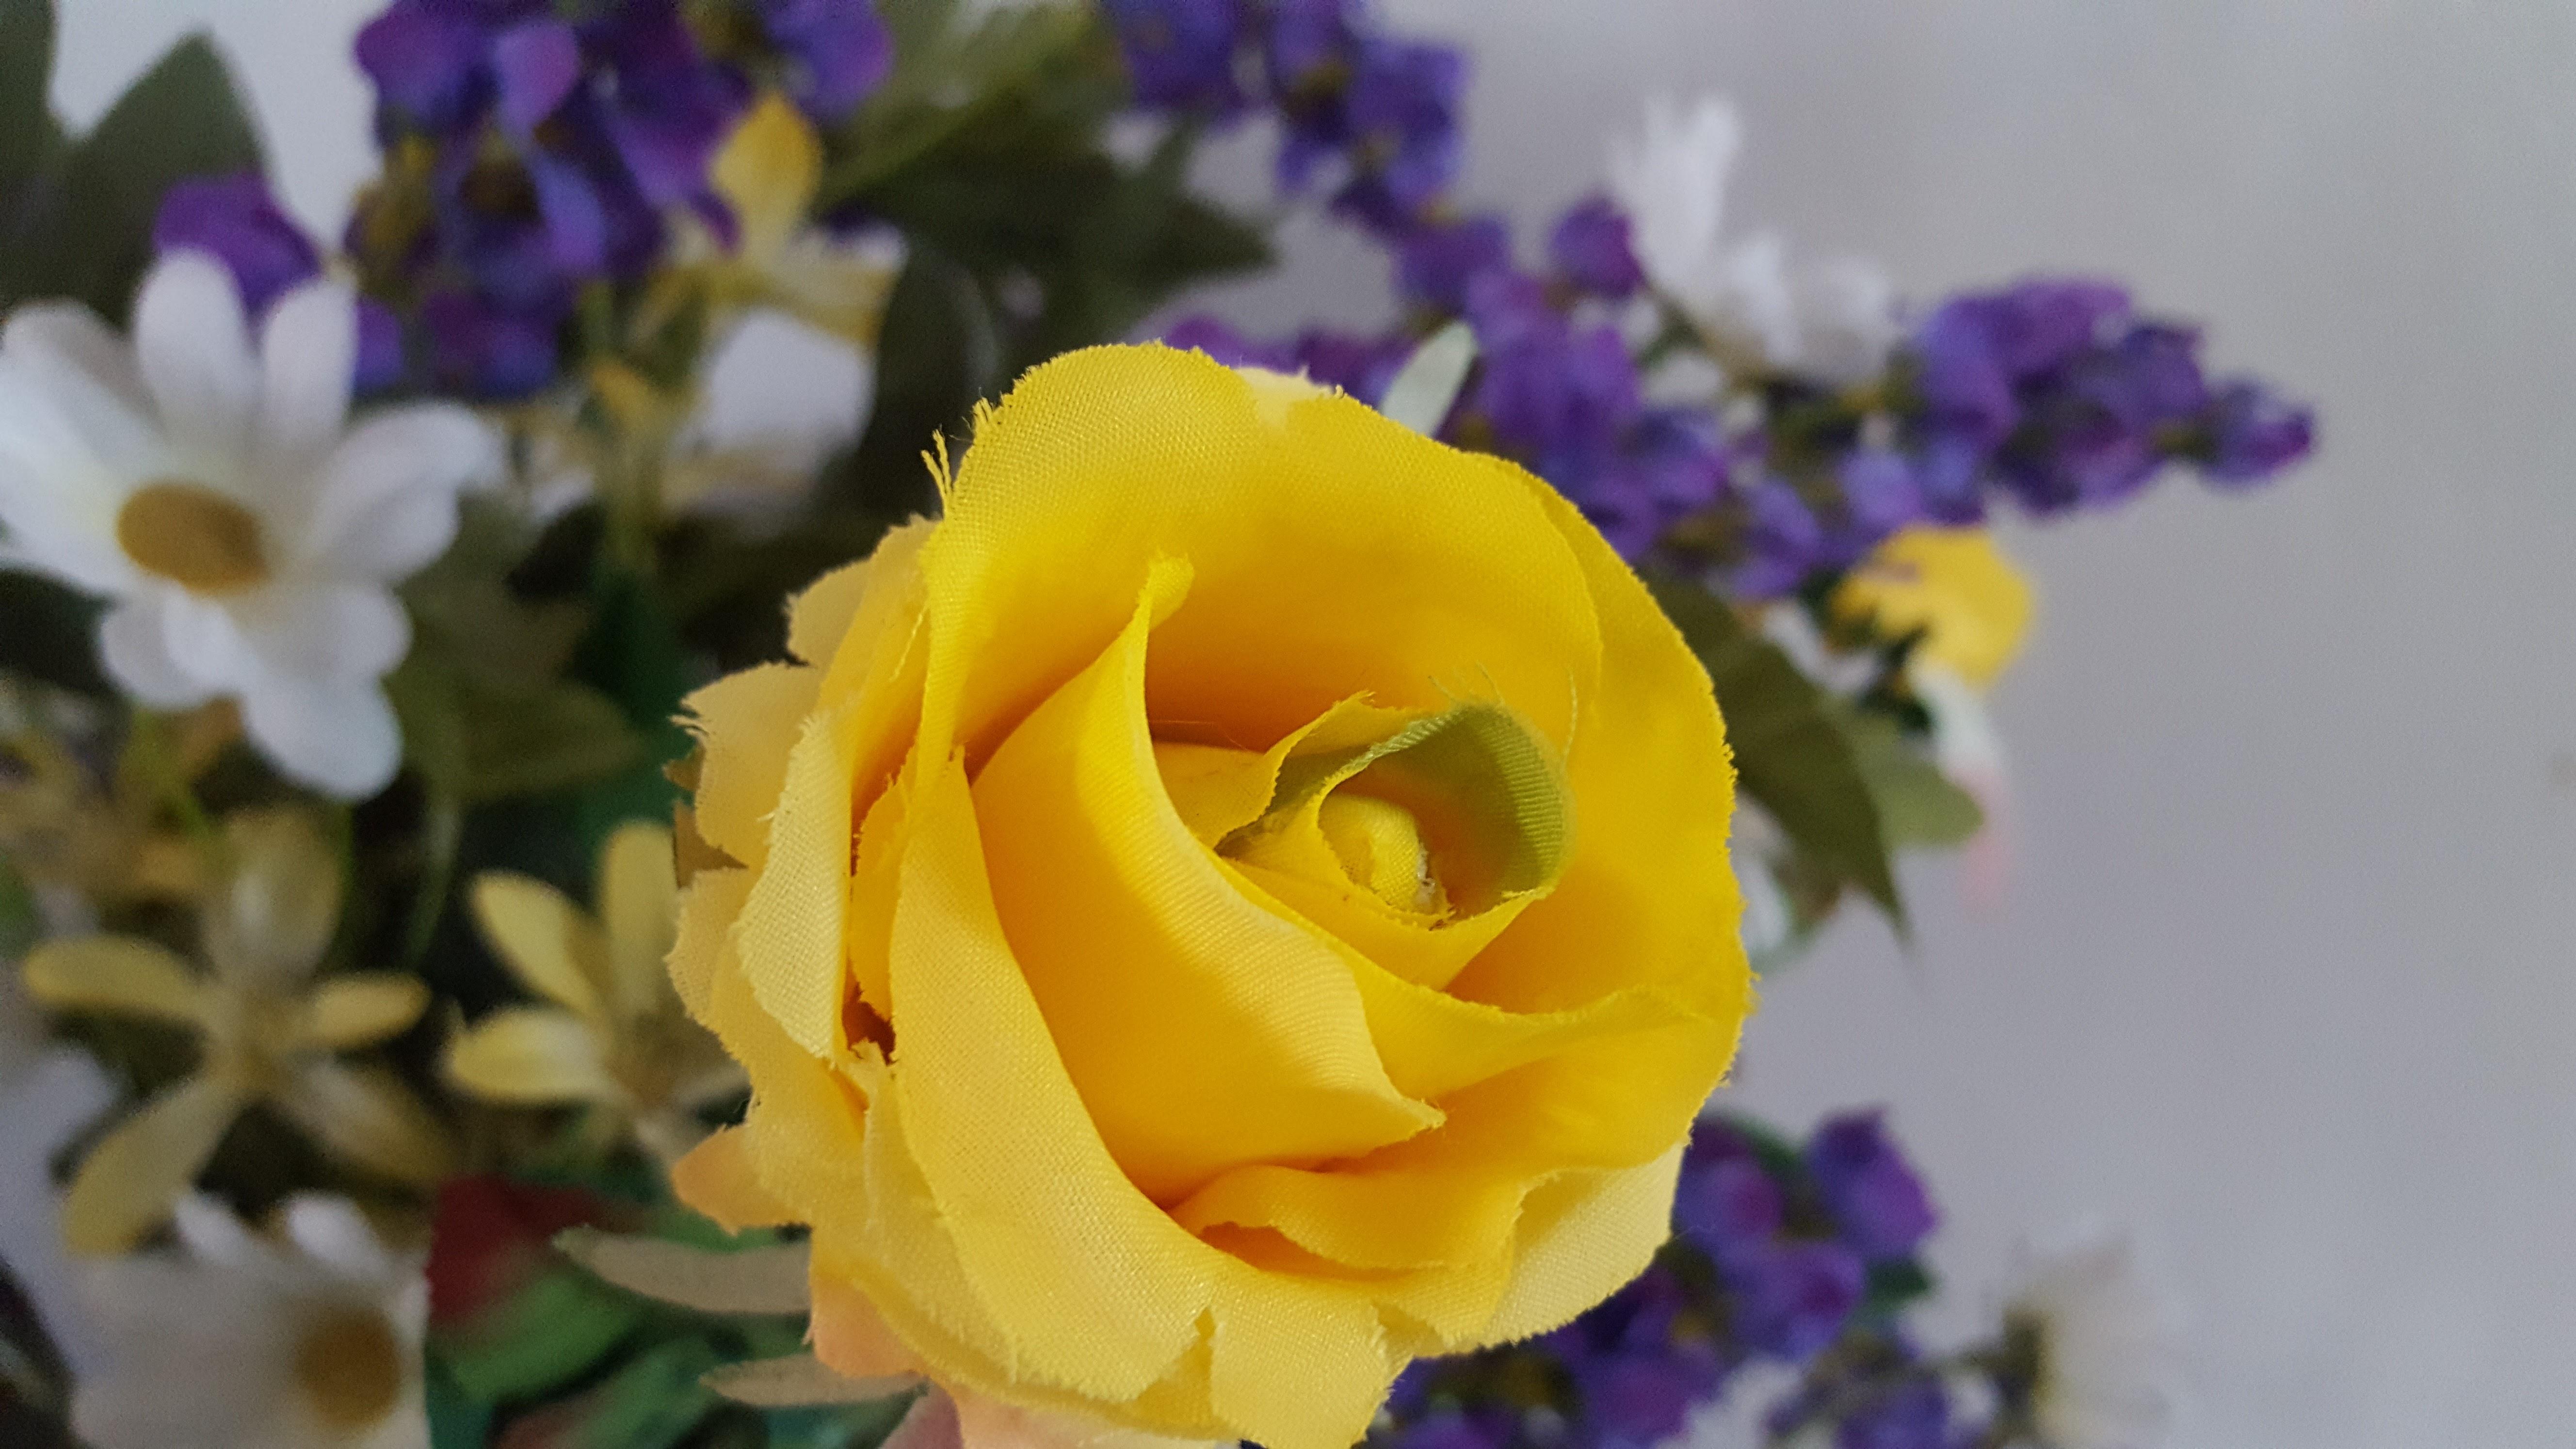 Flower Yellow Rose Family Flora Flowering Plant Petal Wildflower Floristry Cut Flowers Order